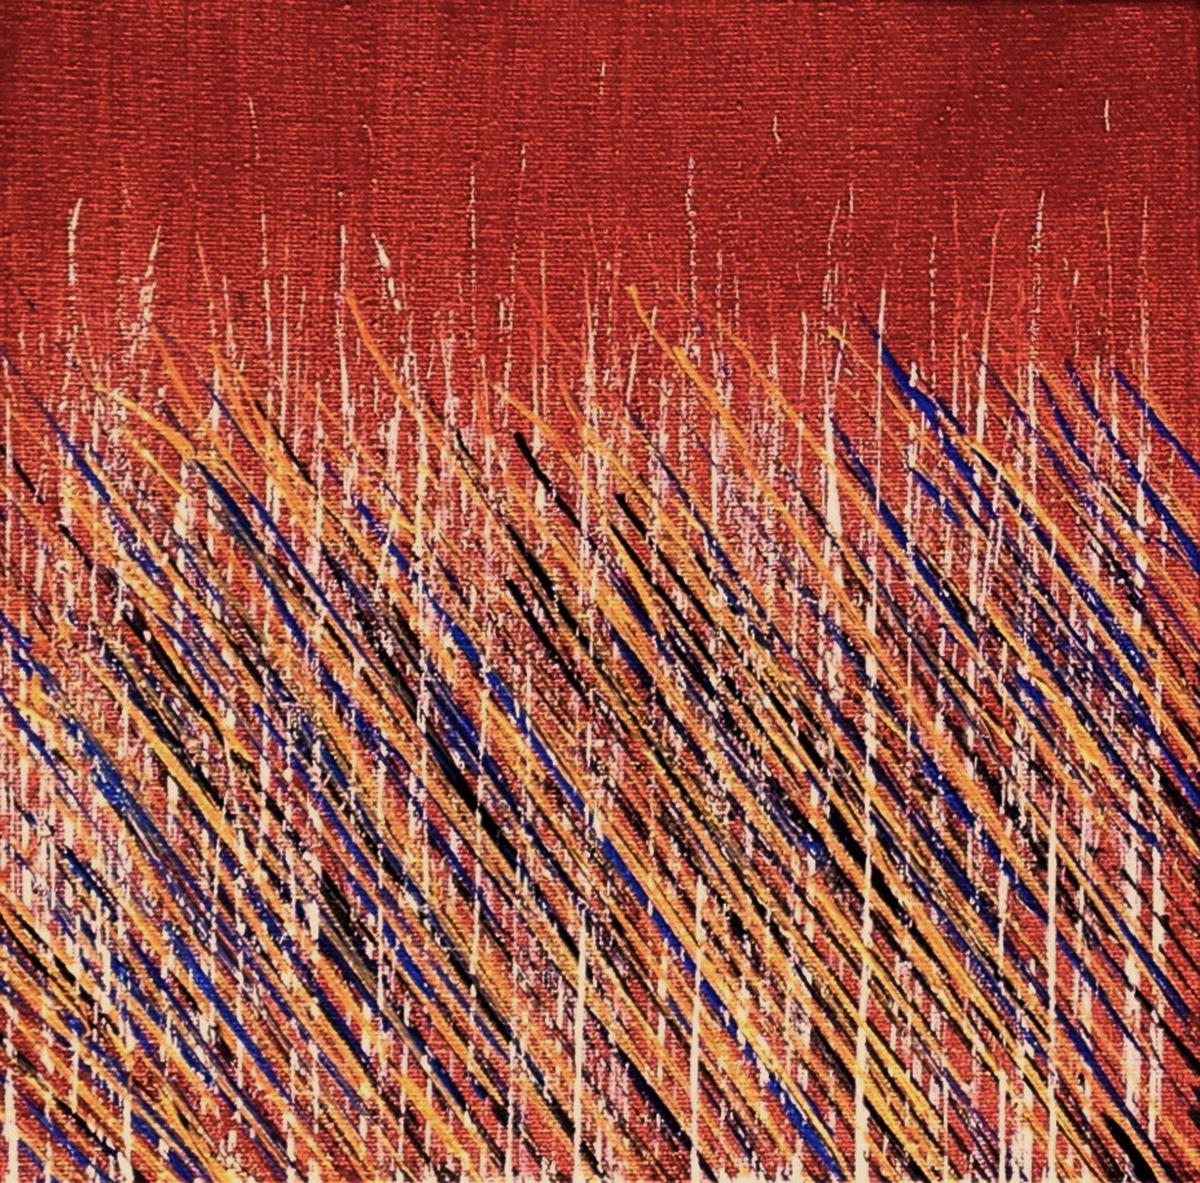 Mary D. Ott_Copper III_2016_Acrylic on canvas_10_ x 10__$250.jpg